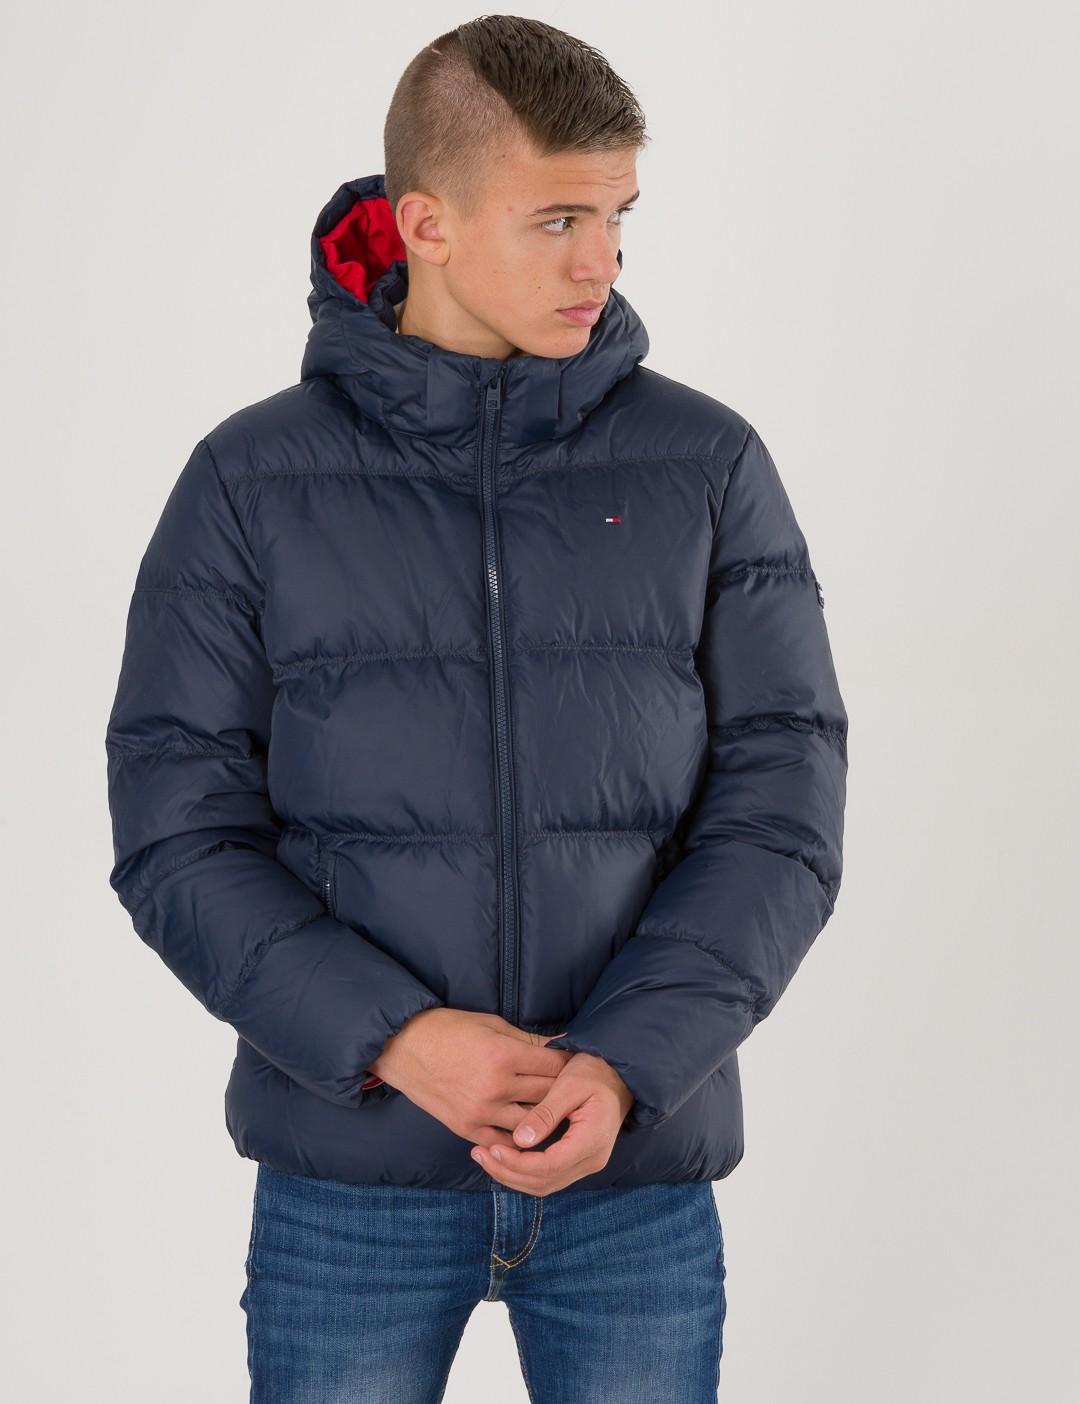 eca37cb3 Om Essential Basic Down Jacket - Blå från Tommy Hilfiger ...